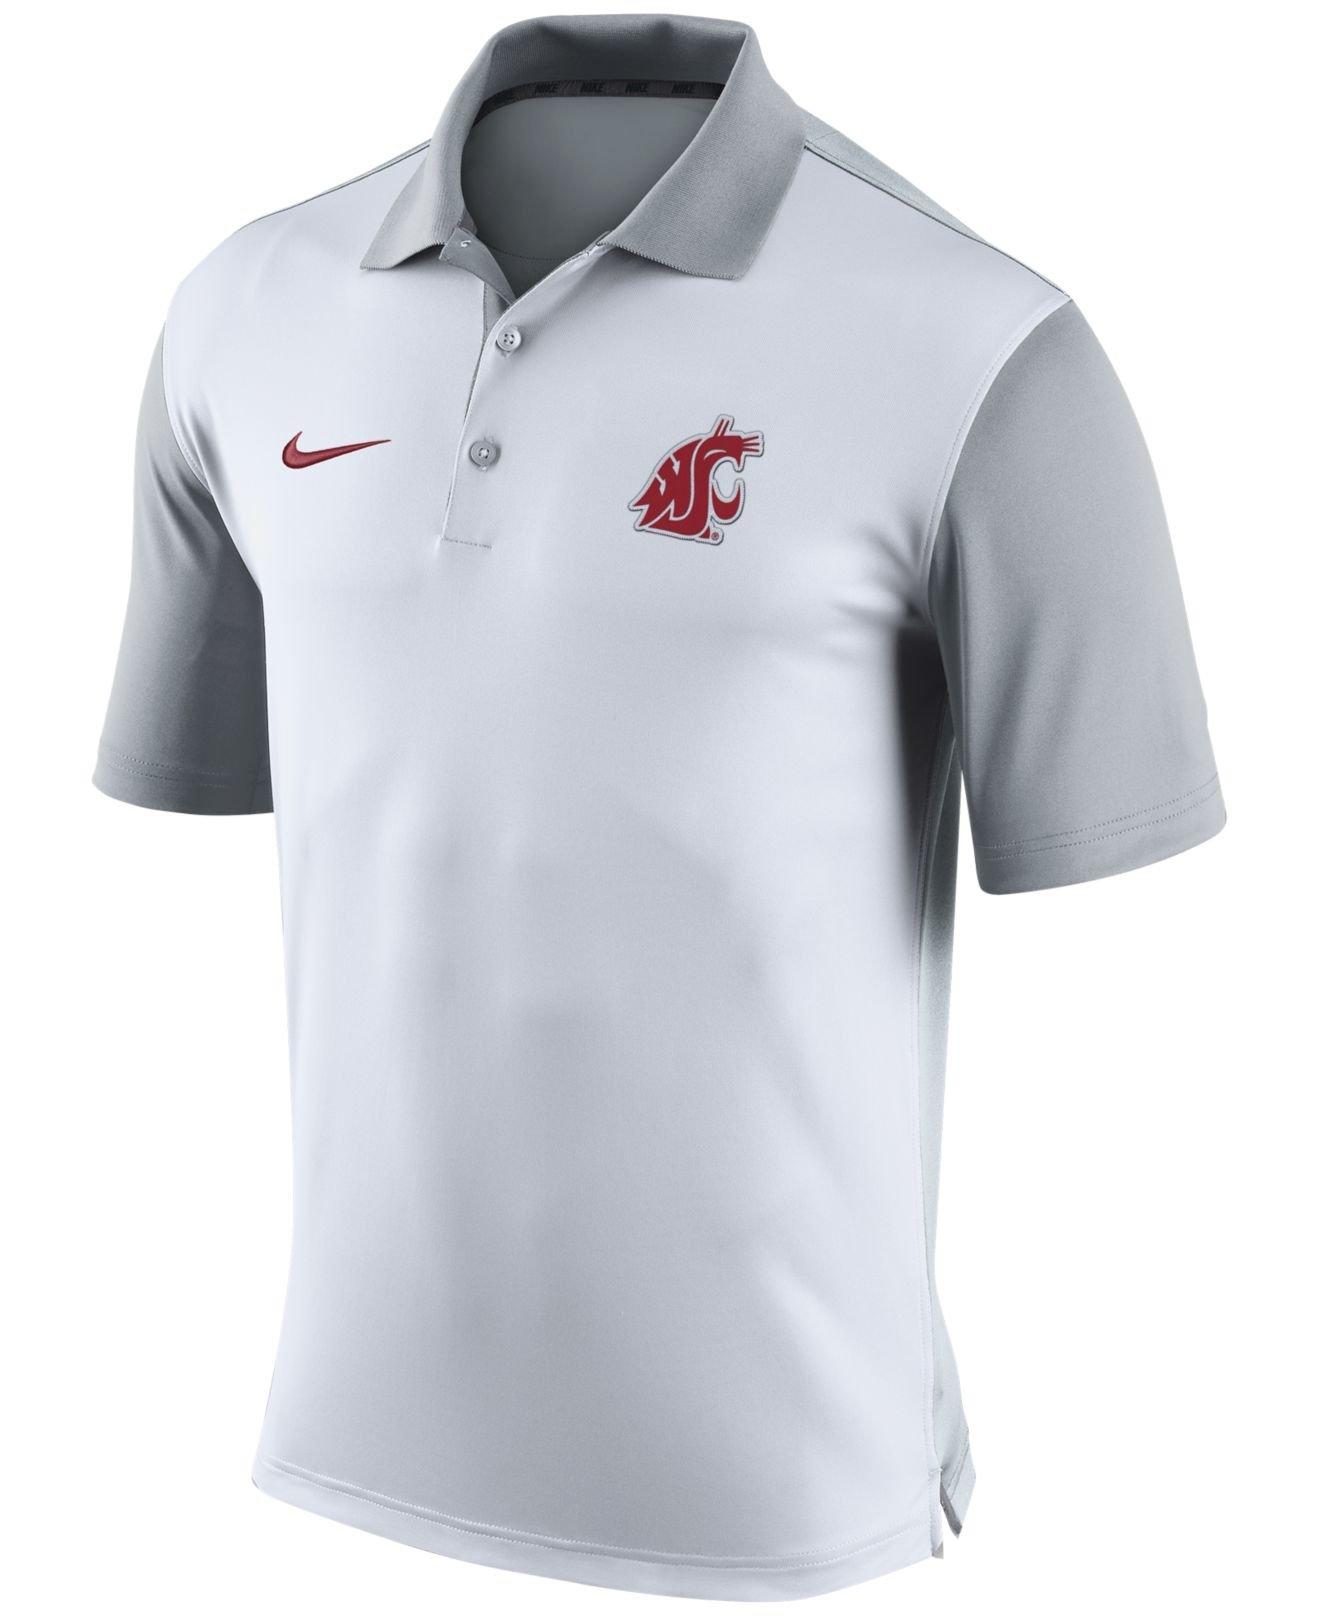 7f80a845c Lyst - Nike Men s Washington State Cougars Preseason Polo in White ...